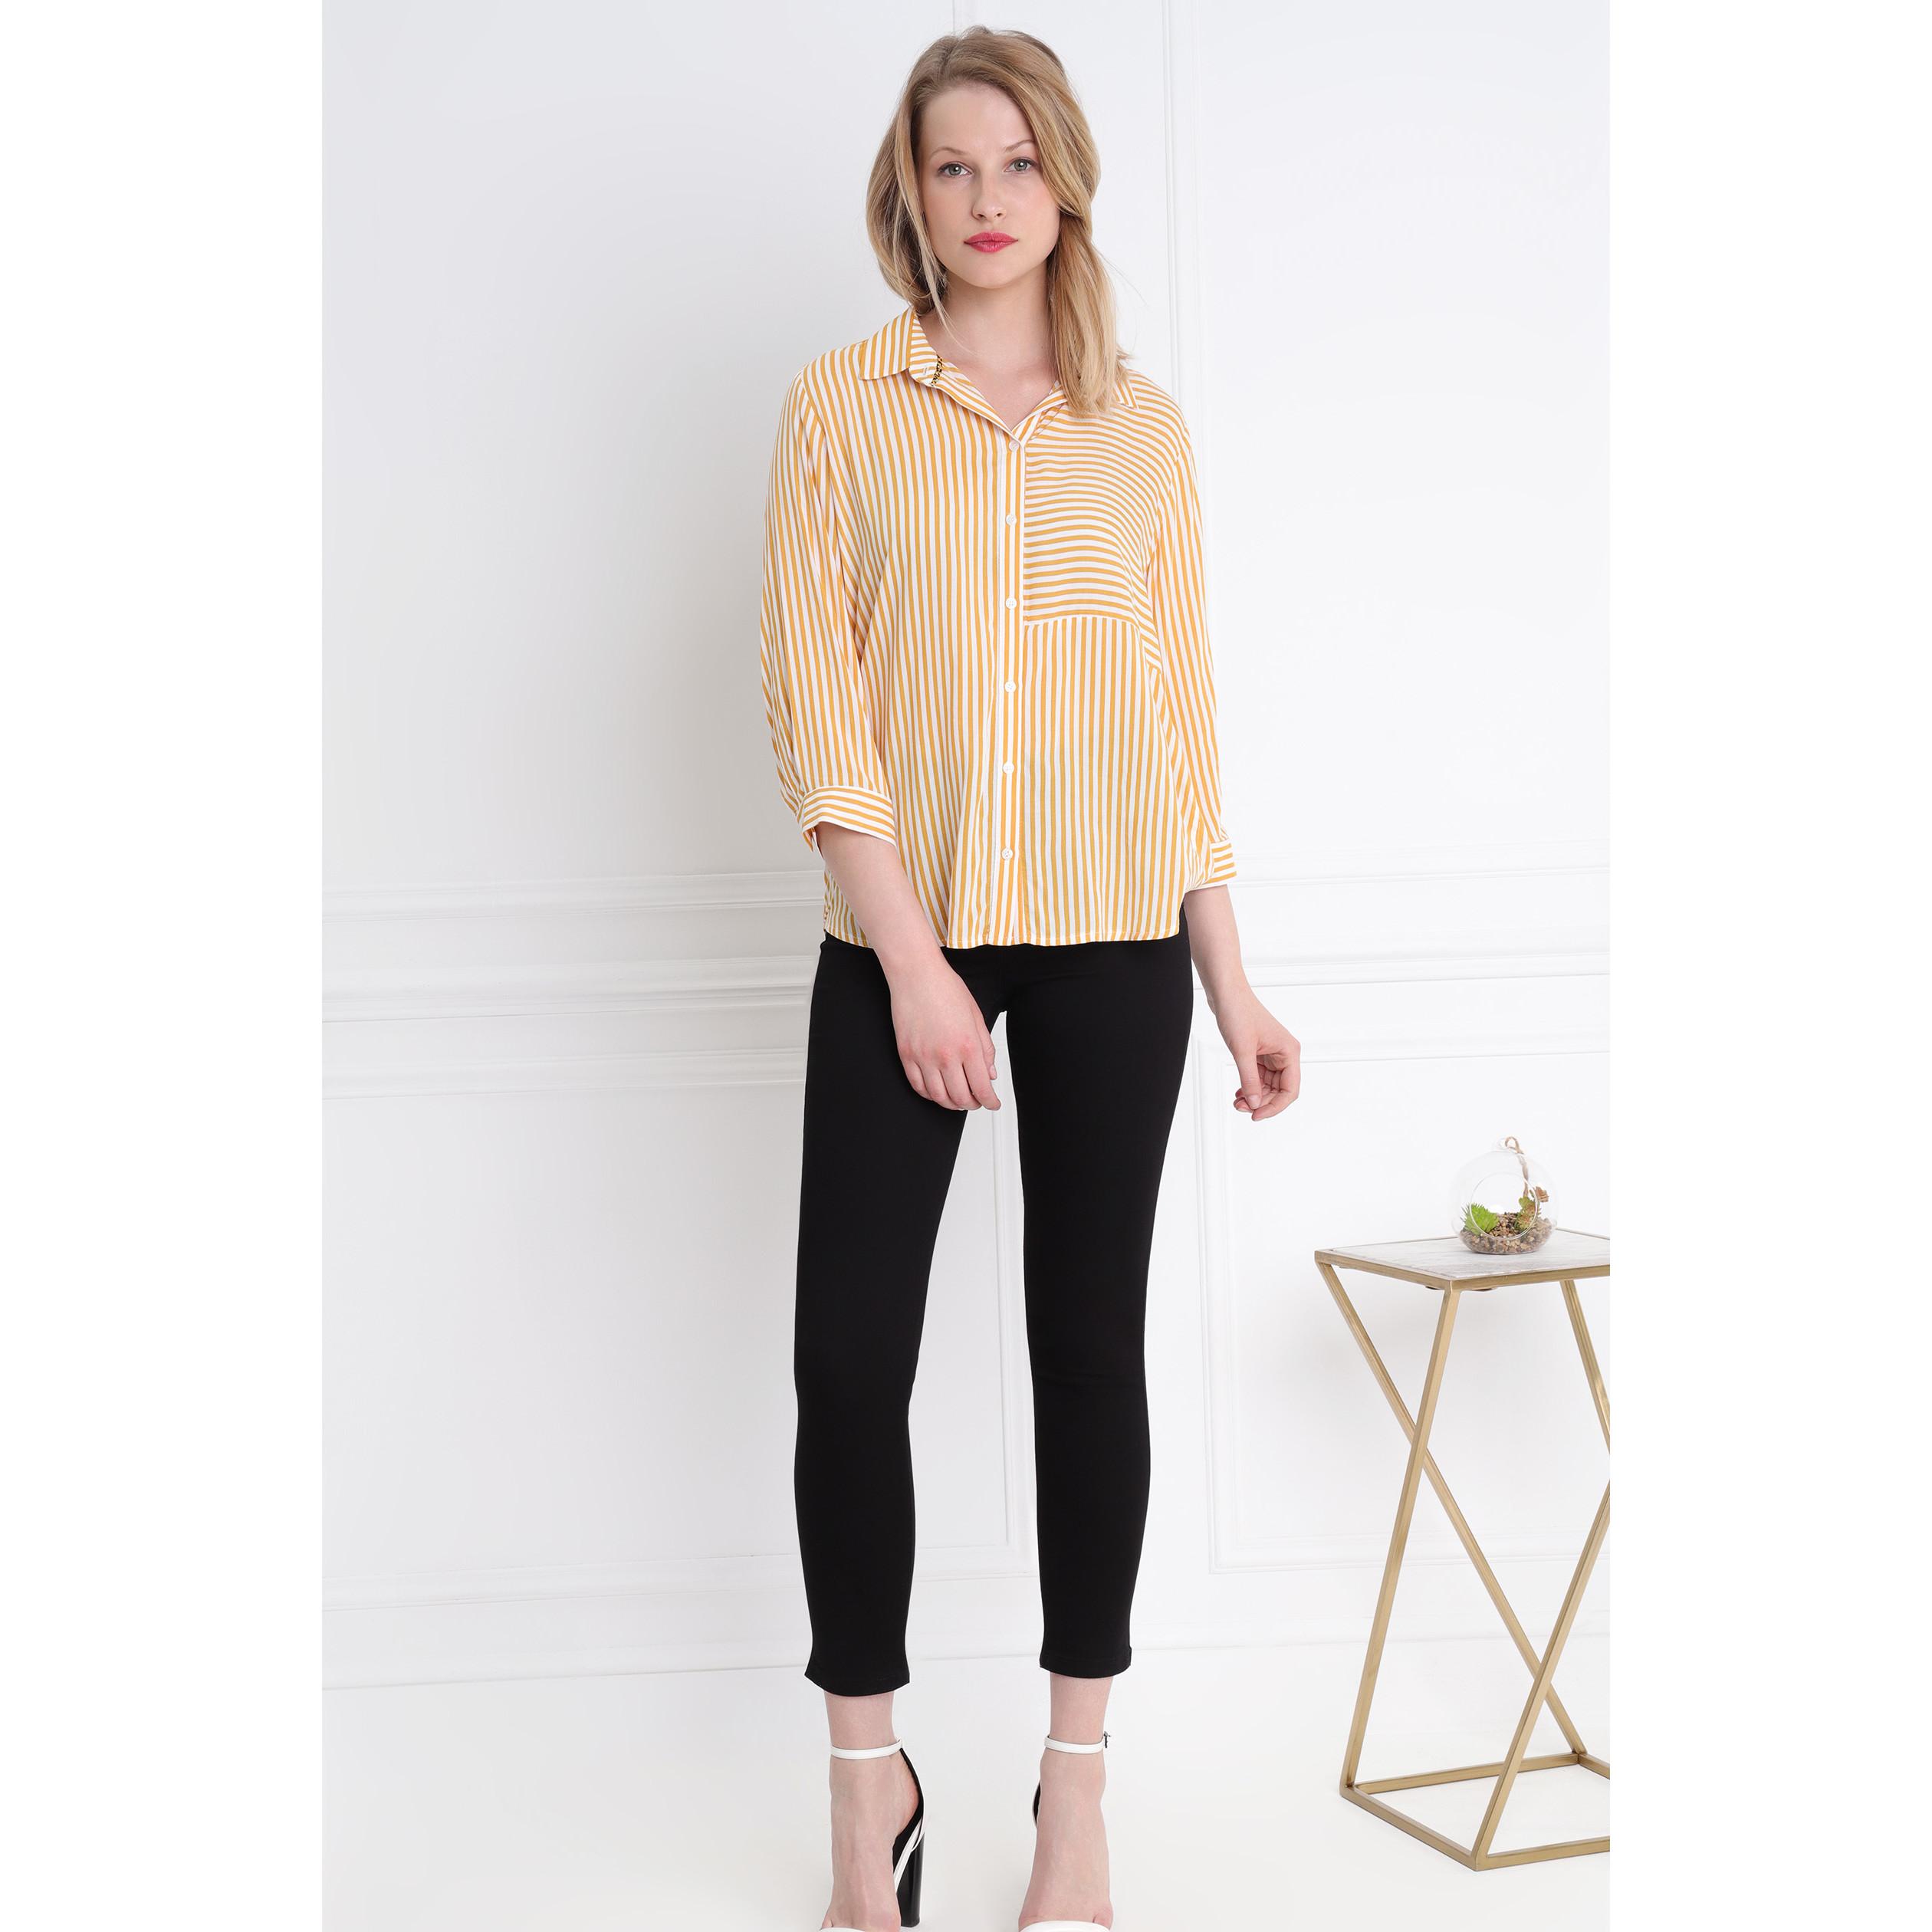 Camisa rayas de amarillo a dos oro tonos en u3FKcTl1J